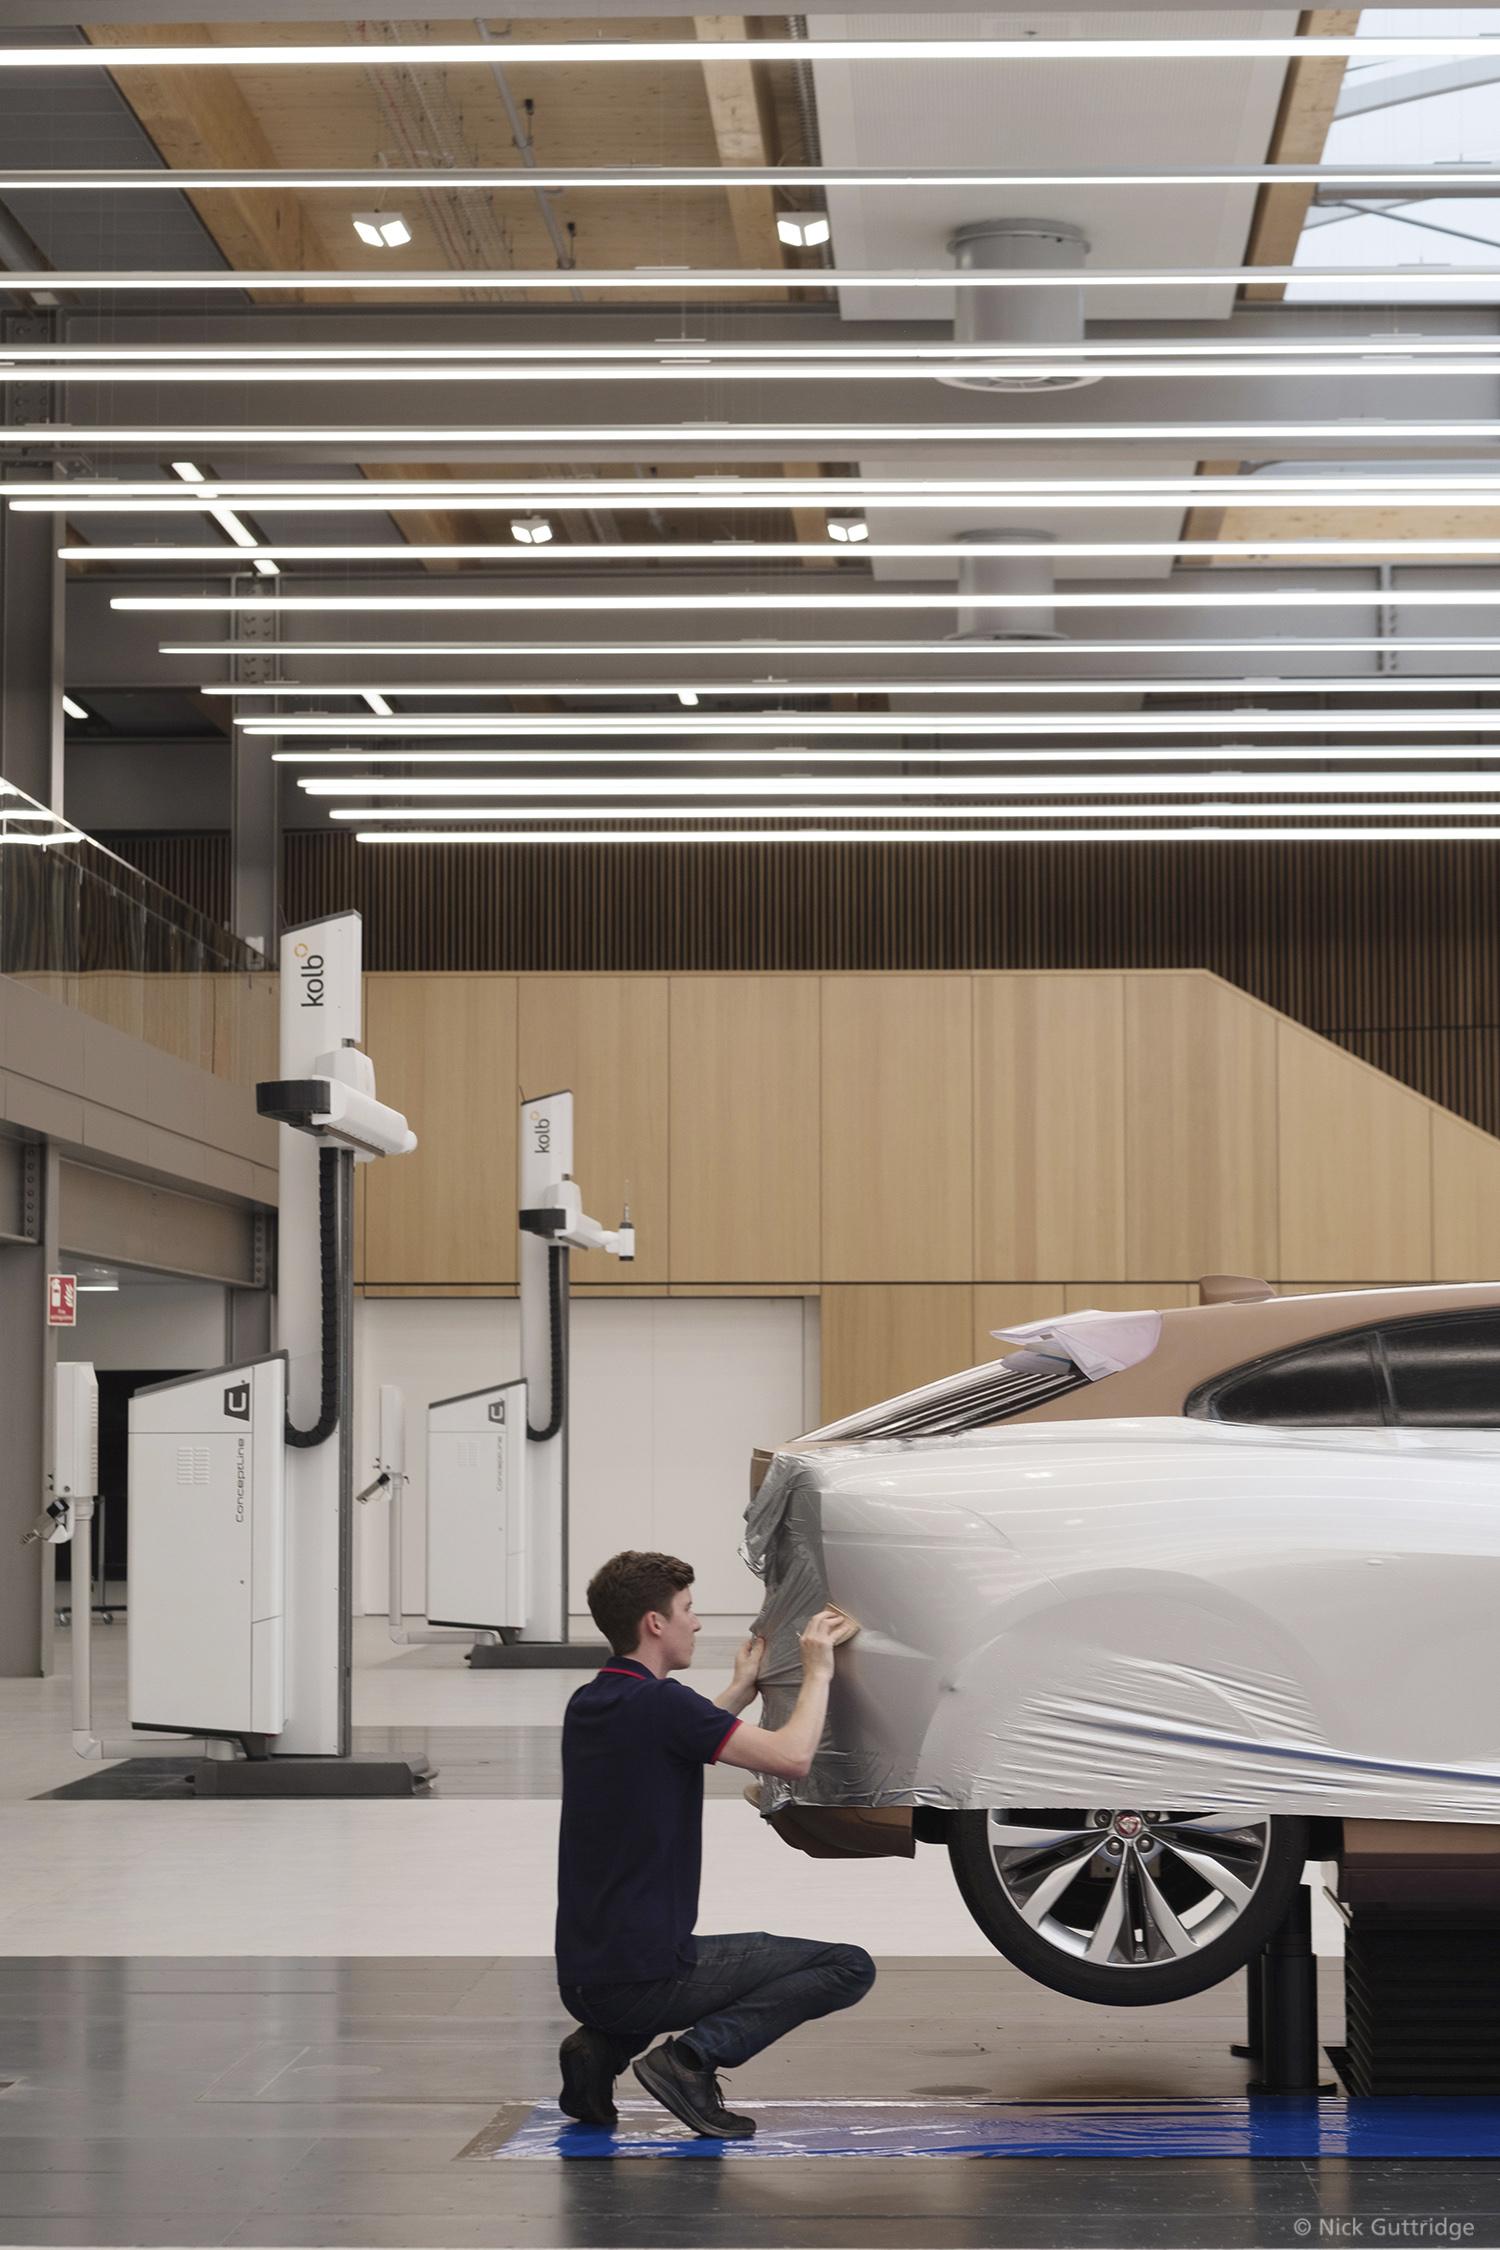 NGUT-1497-Jaguar-260919-NickGuttridge-DSCF3736.jpg